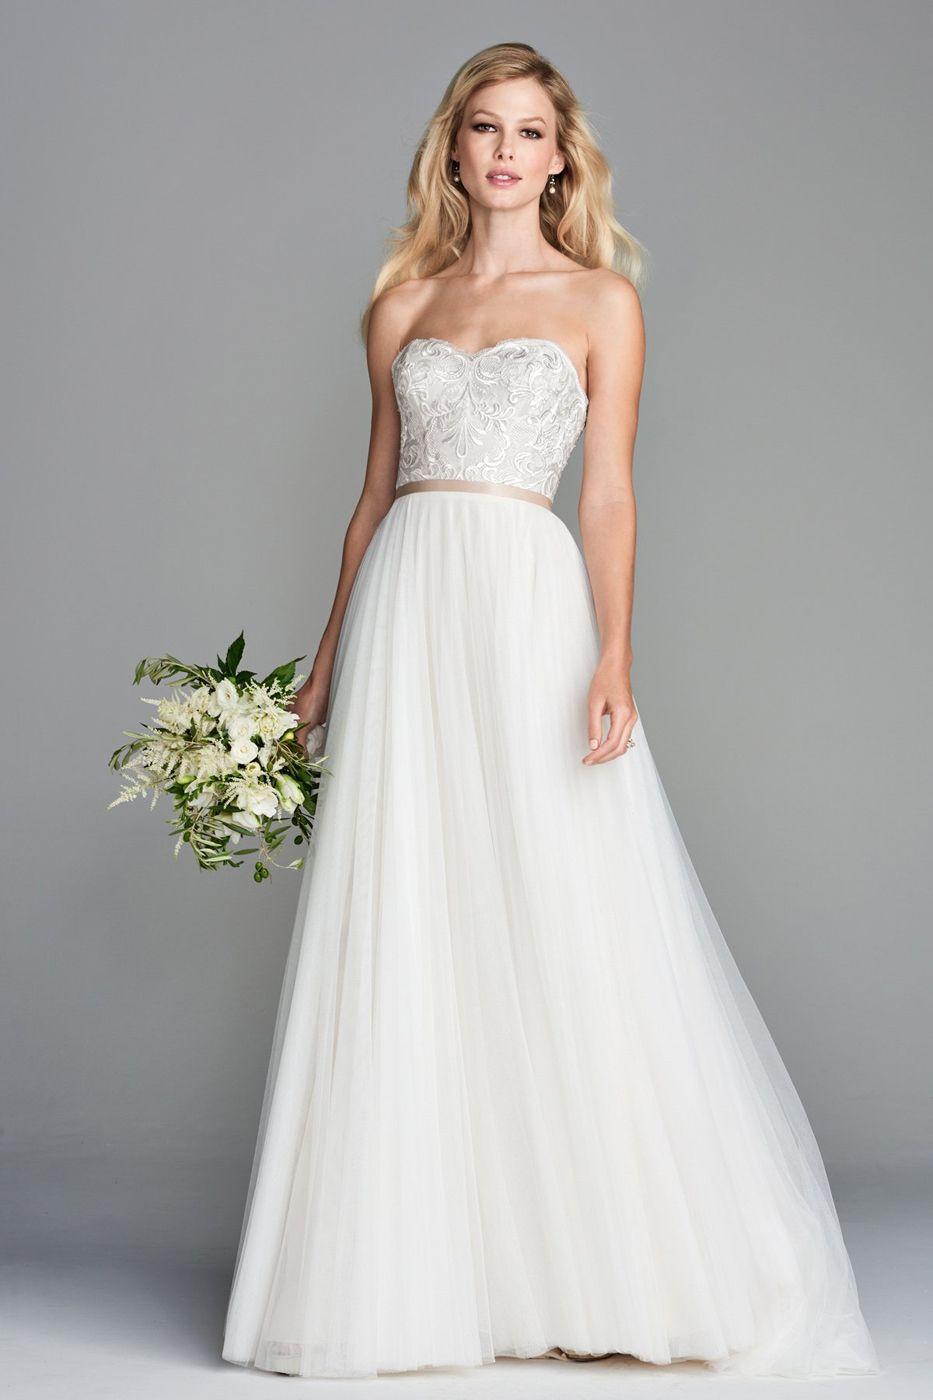 WTOO 10707 Yvaine Strapless A-line Bridal Dress